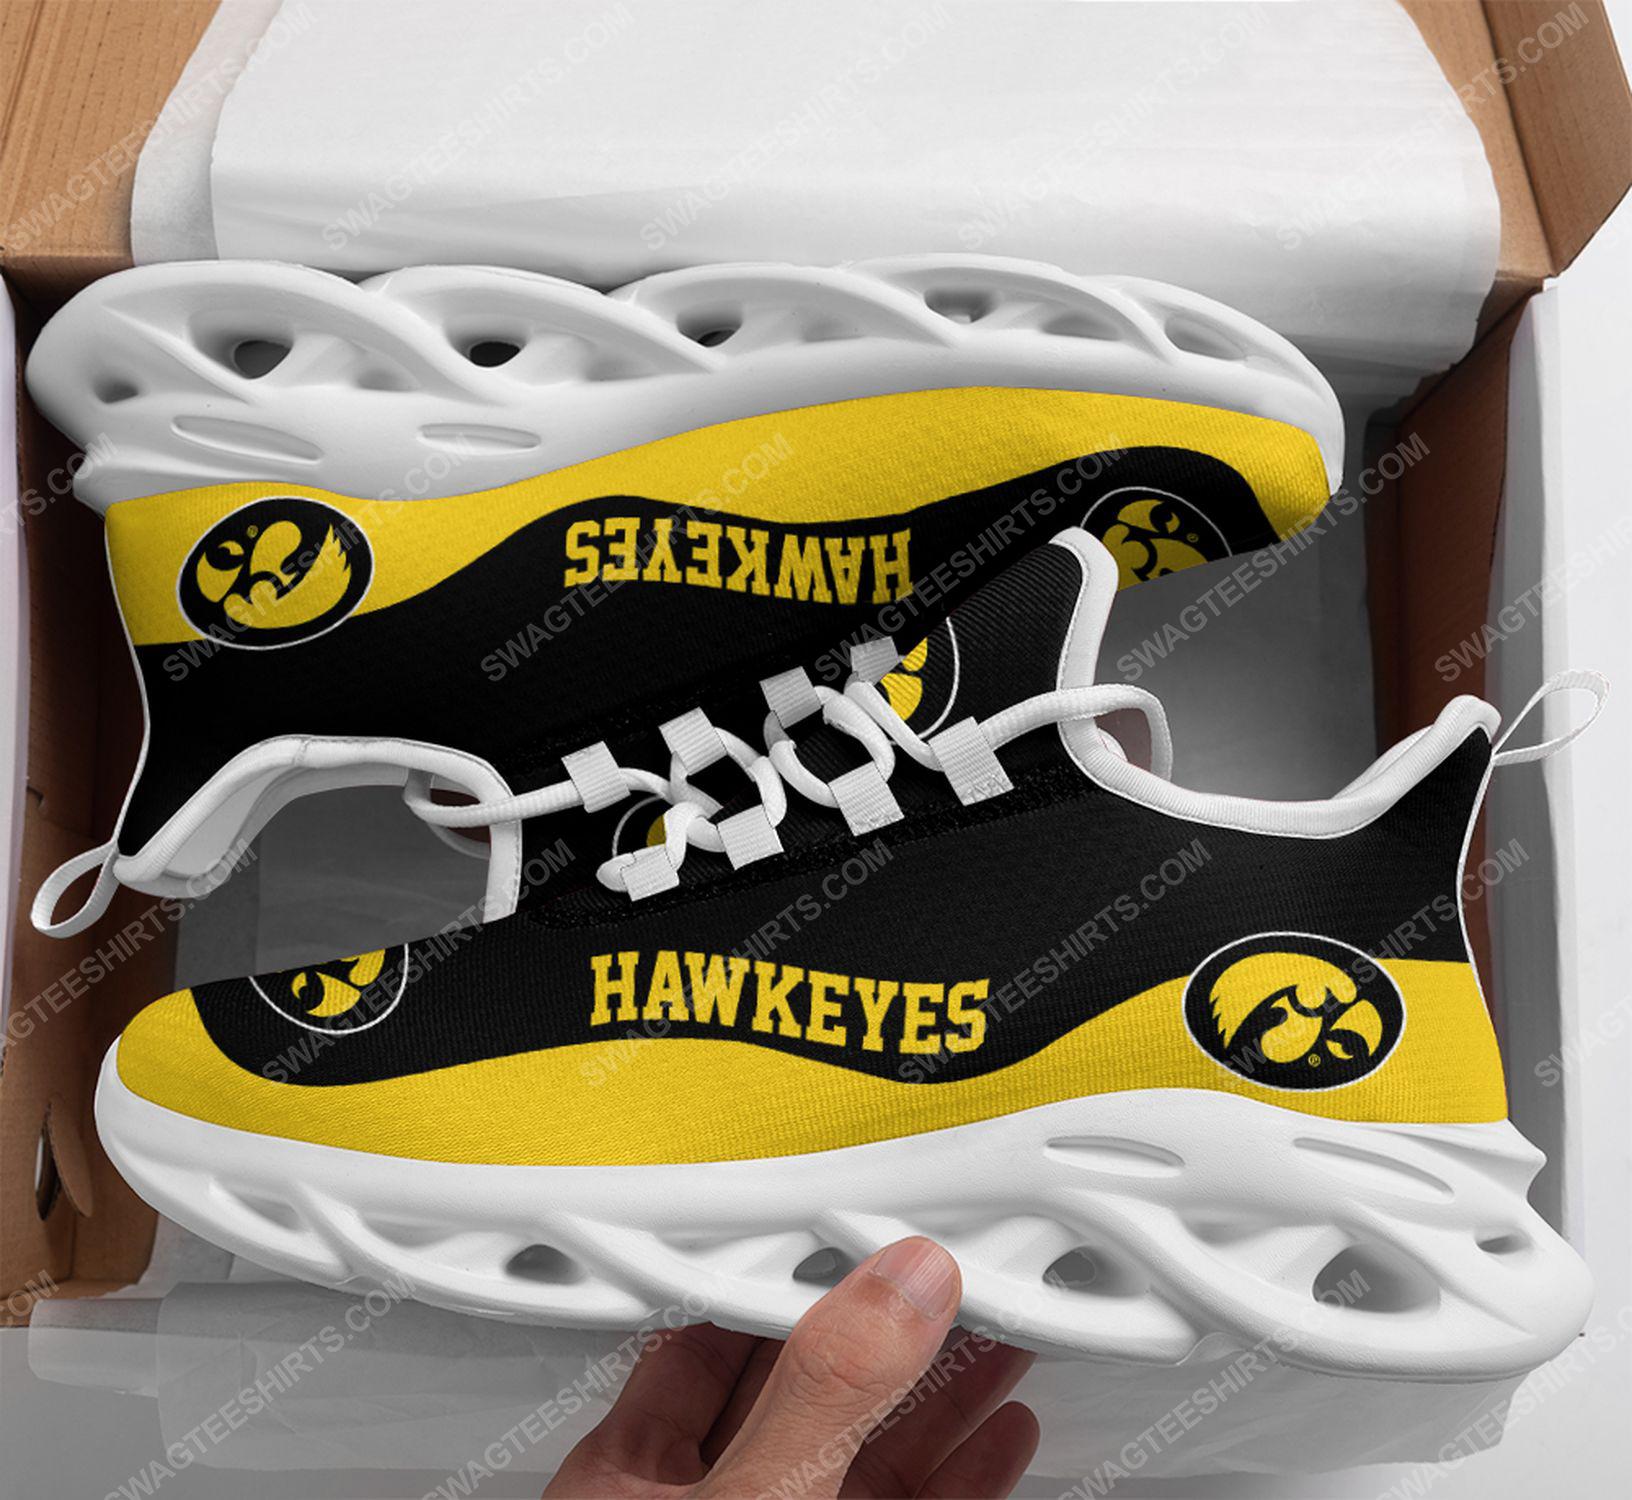 The iowa hawkeyes football team max soul shoes 1